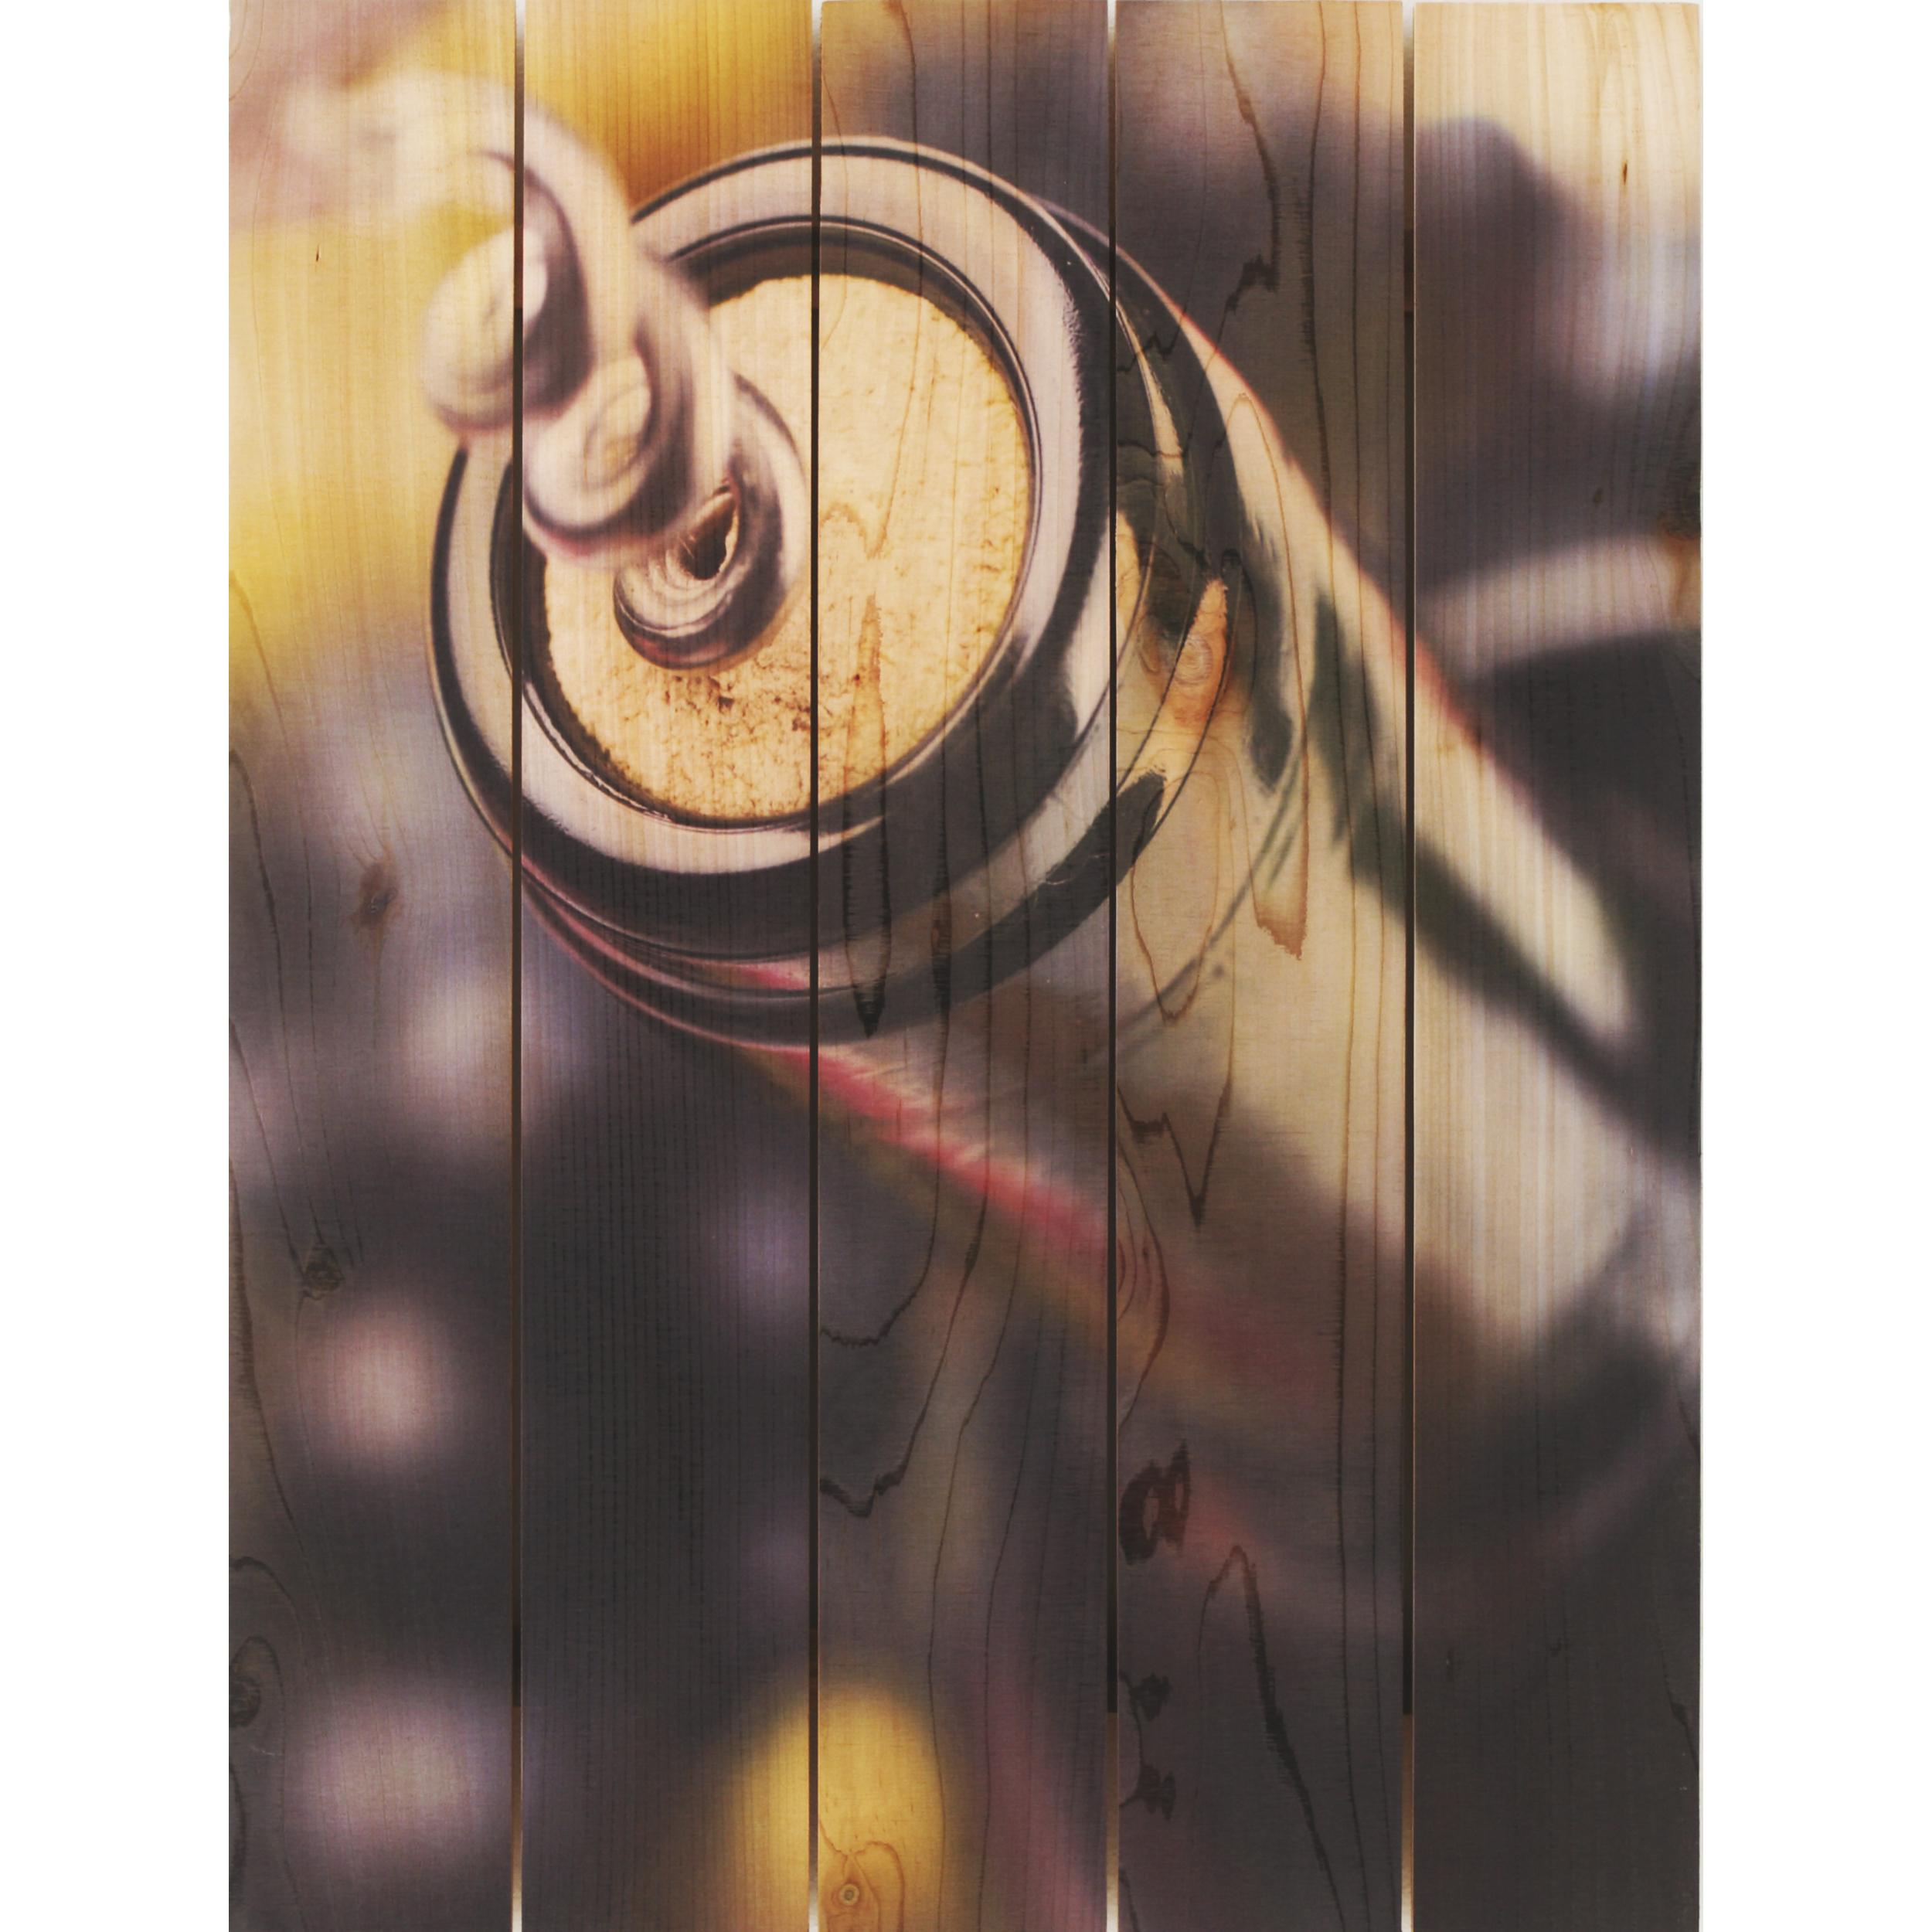 Daydream Gizaun Cedar Wall Art, Un Wined, 28